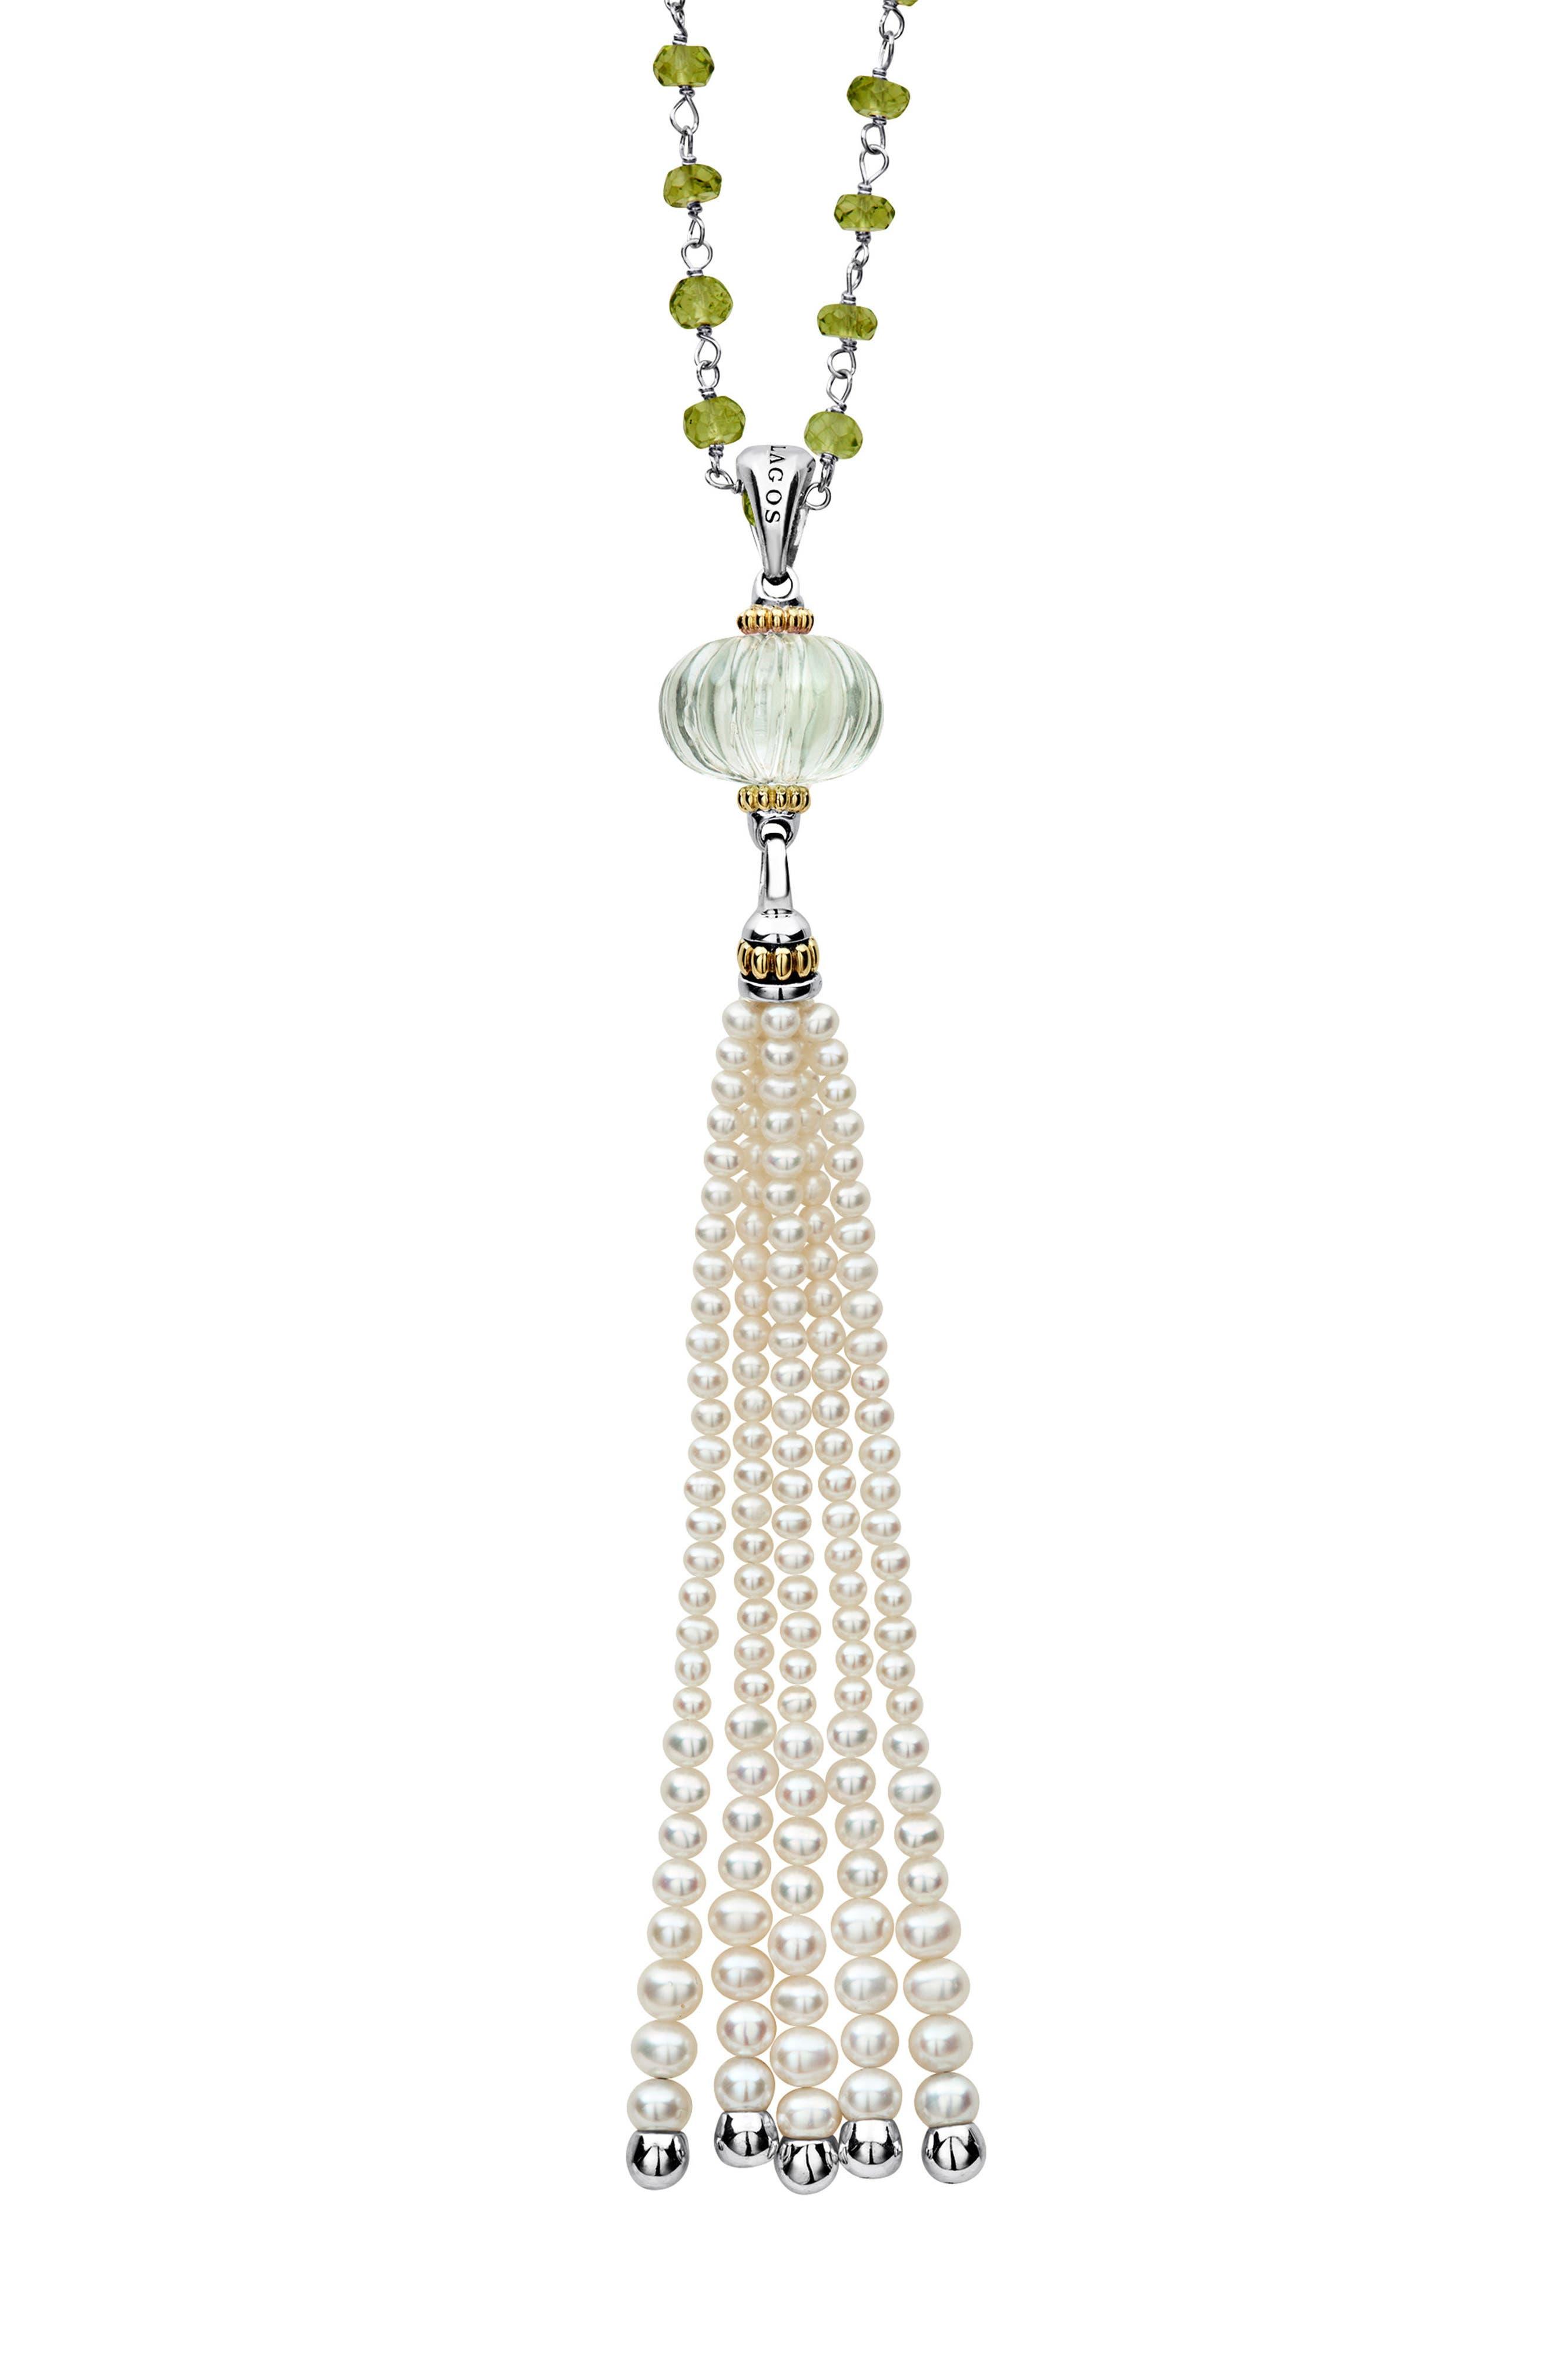 Caviar Forever Gemstone Tassel Pendant Necklace,                             Main thumbnail 1, color,                             SILVER/ GREEN AMETHYST